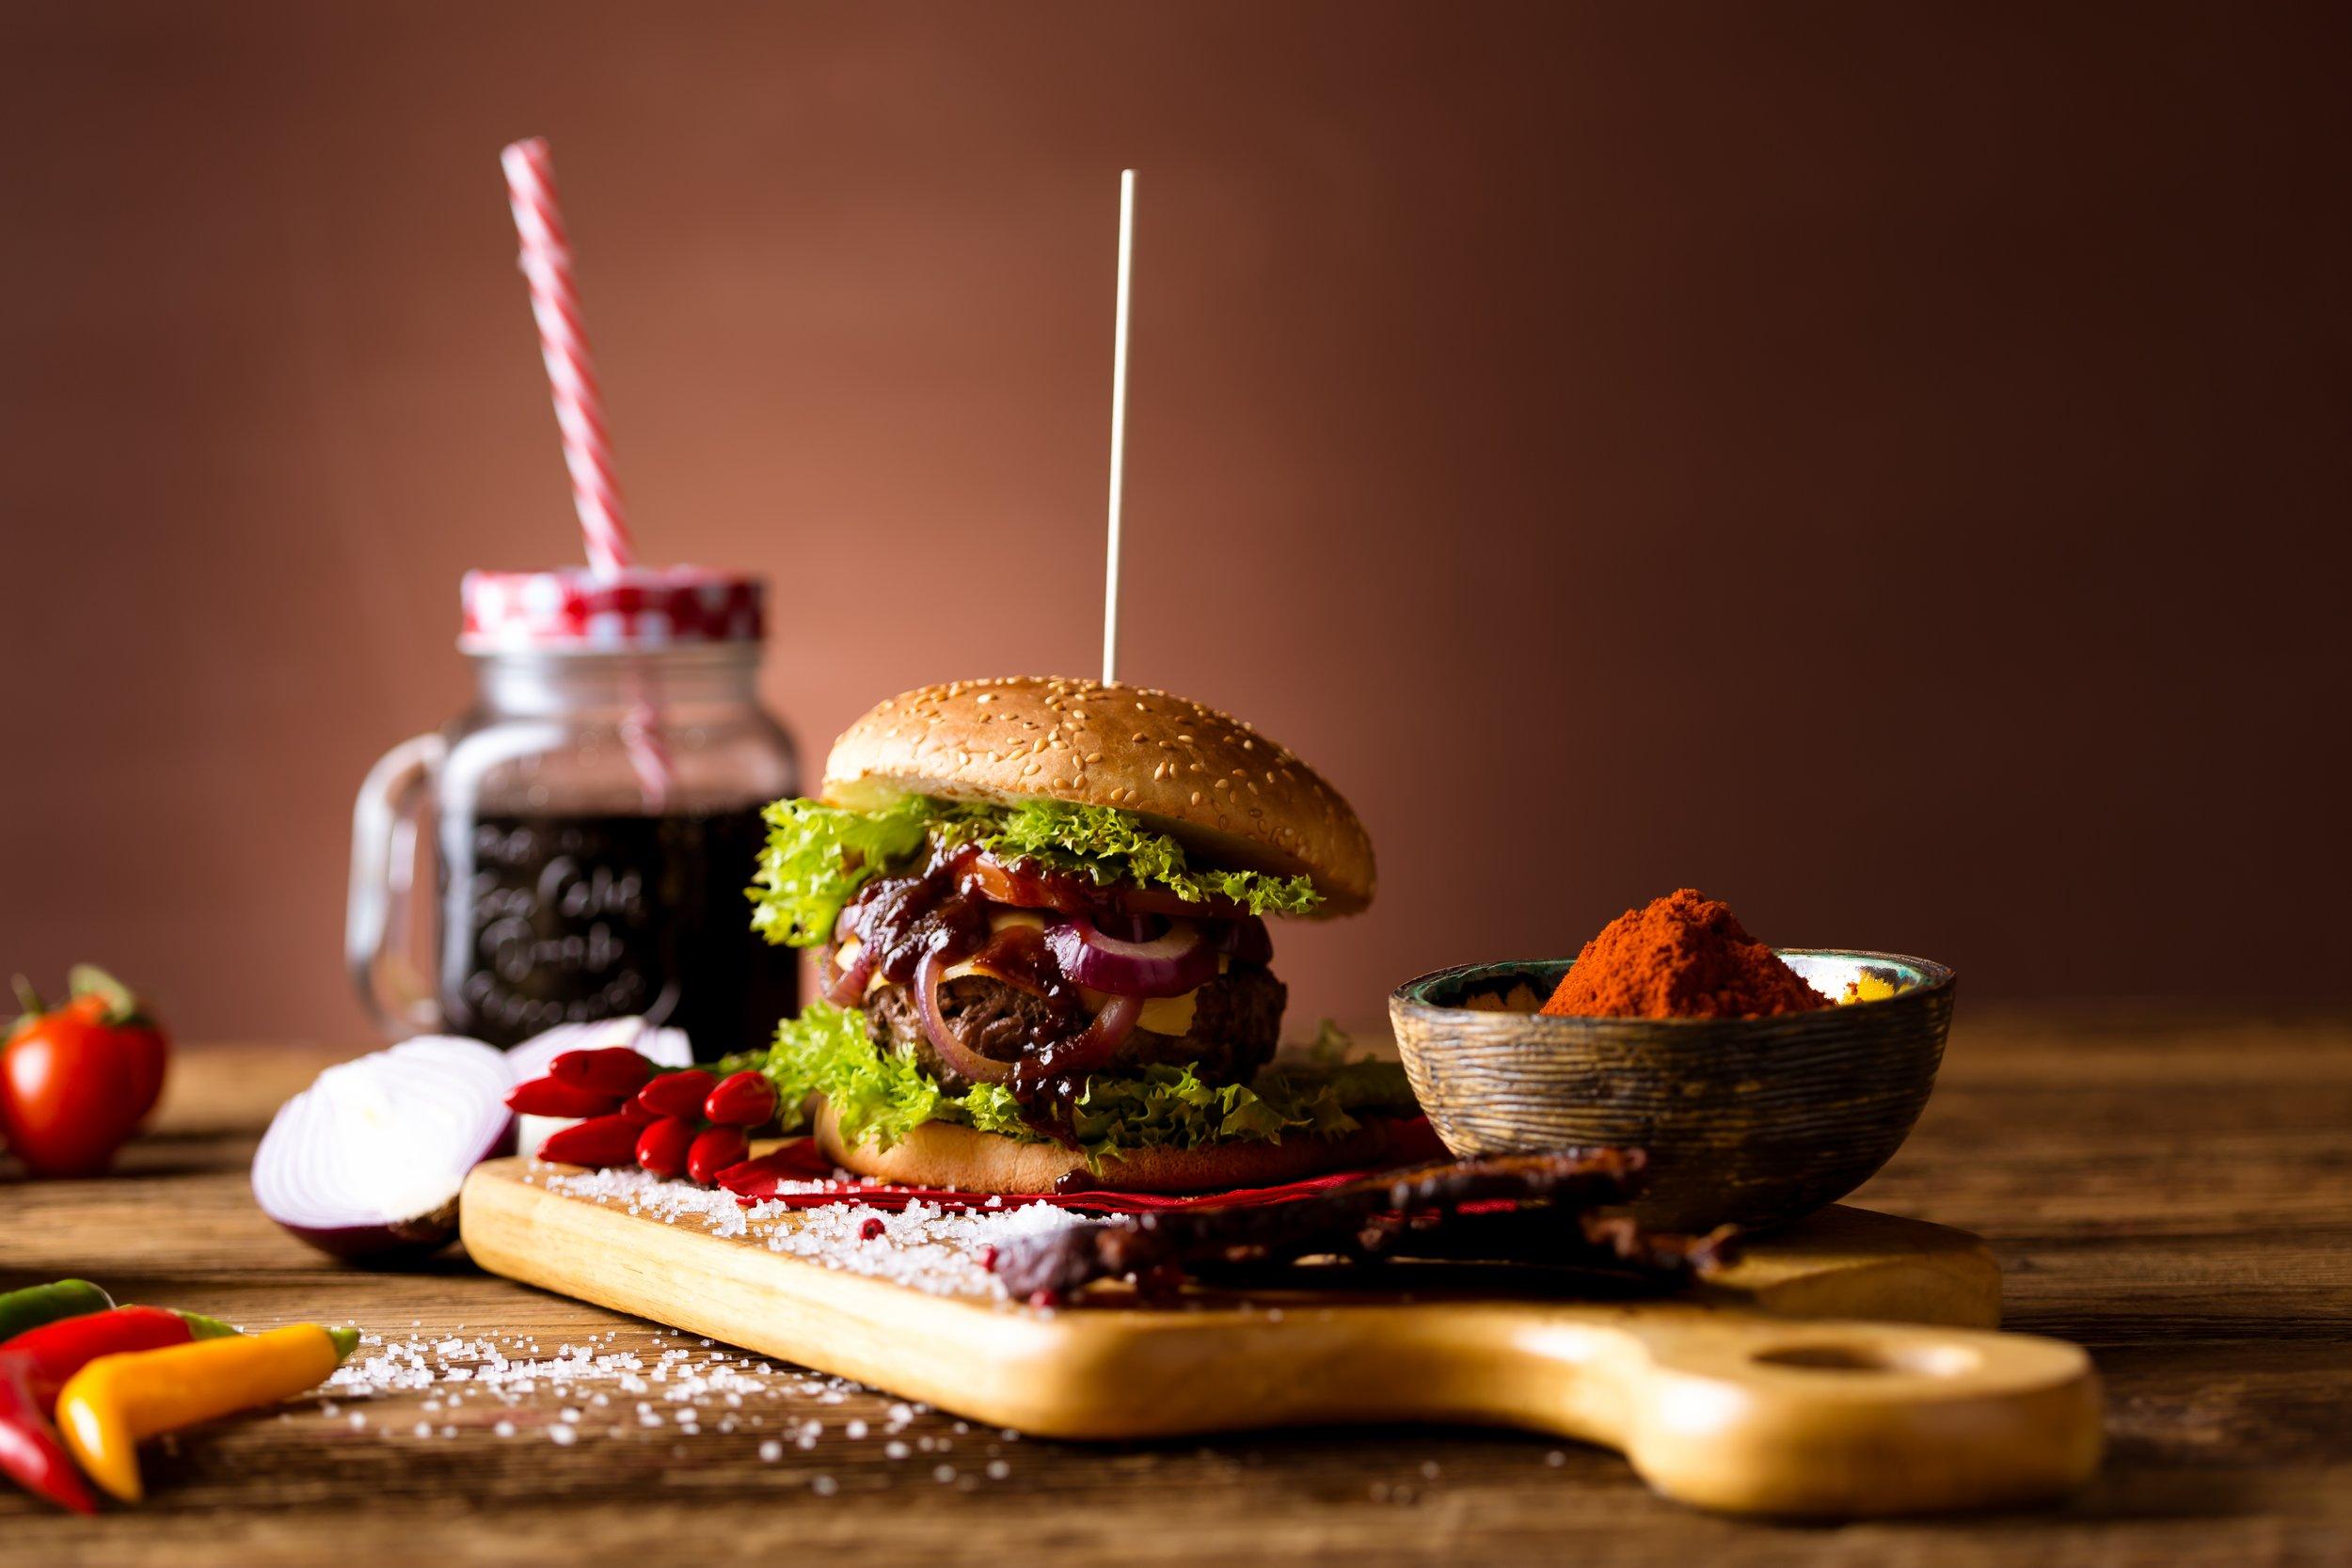 Konteiner burger | Maribor | Supernova